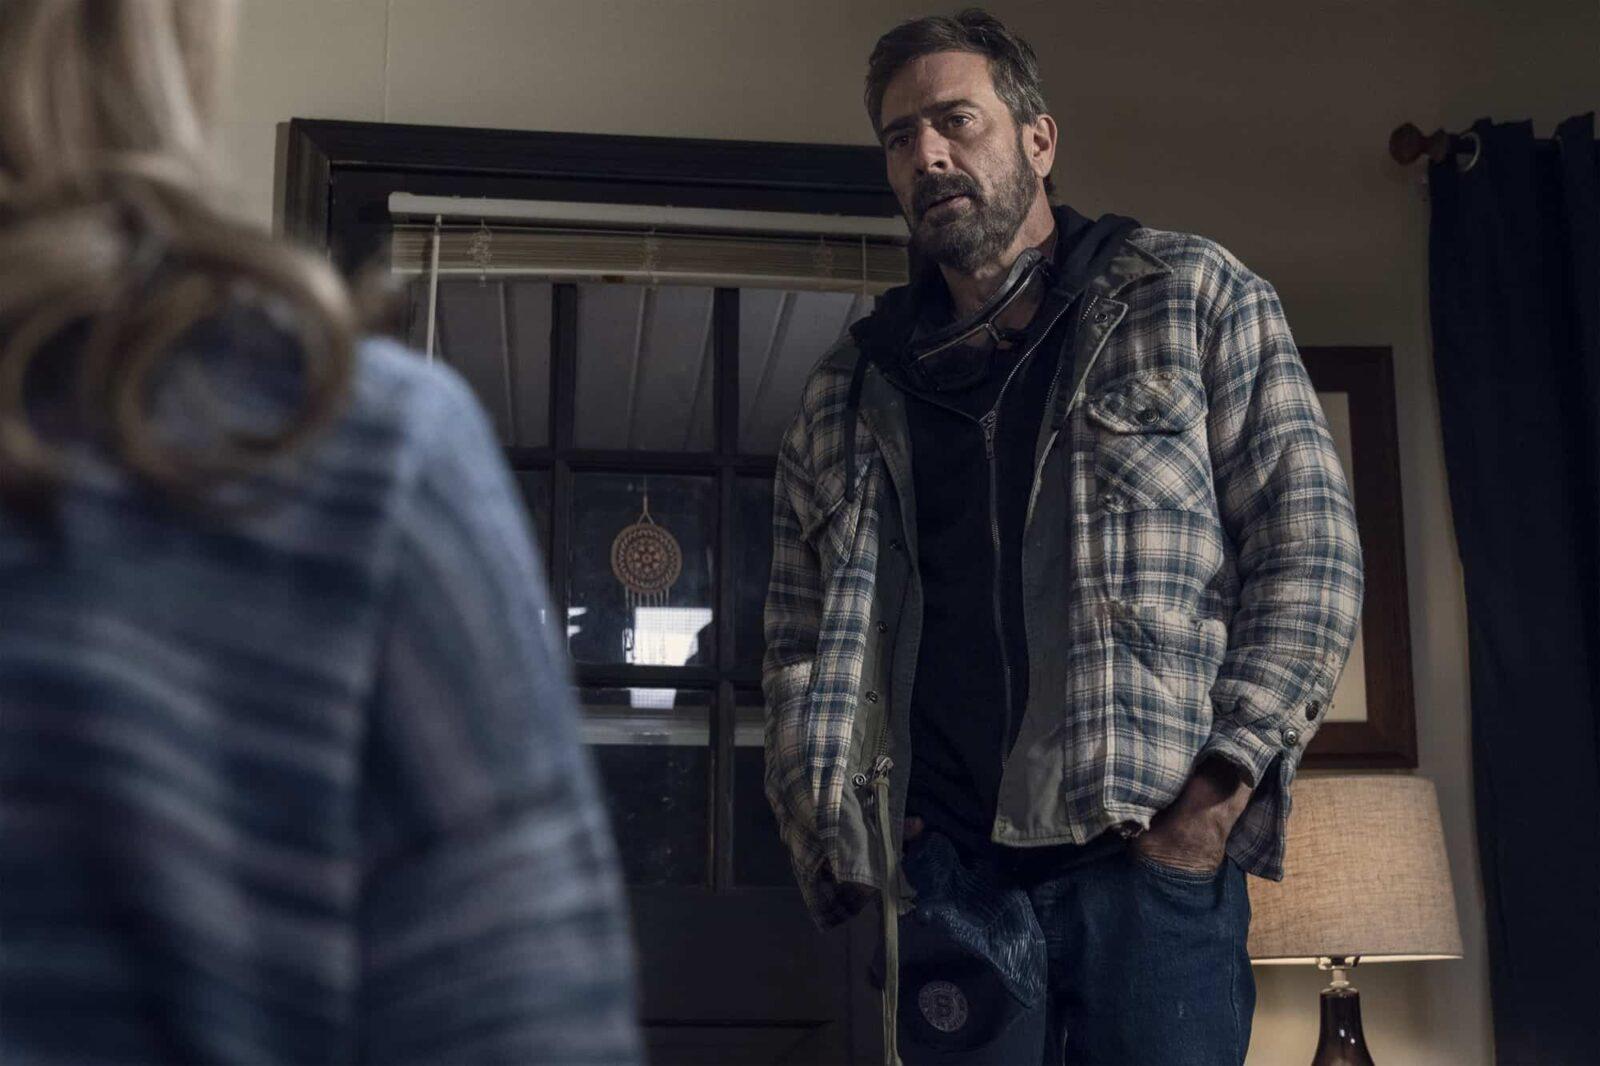 Flashback de Negan (Jeffrey Dean Morgan) en The Walking Dead 10x22 Here's Negan